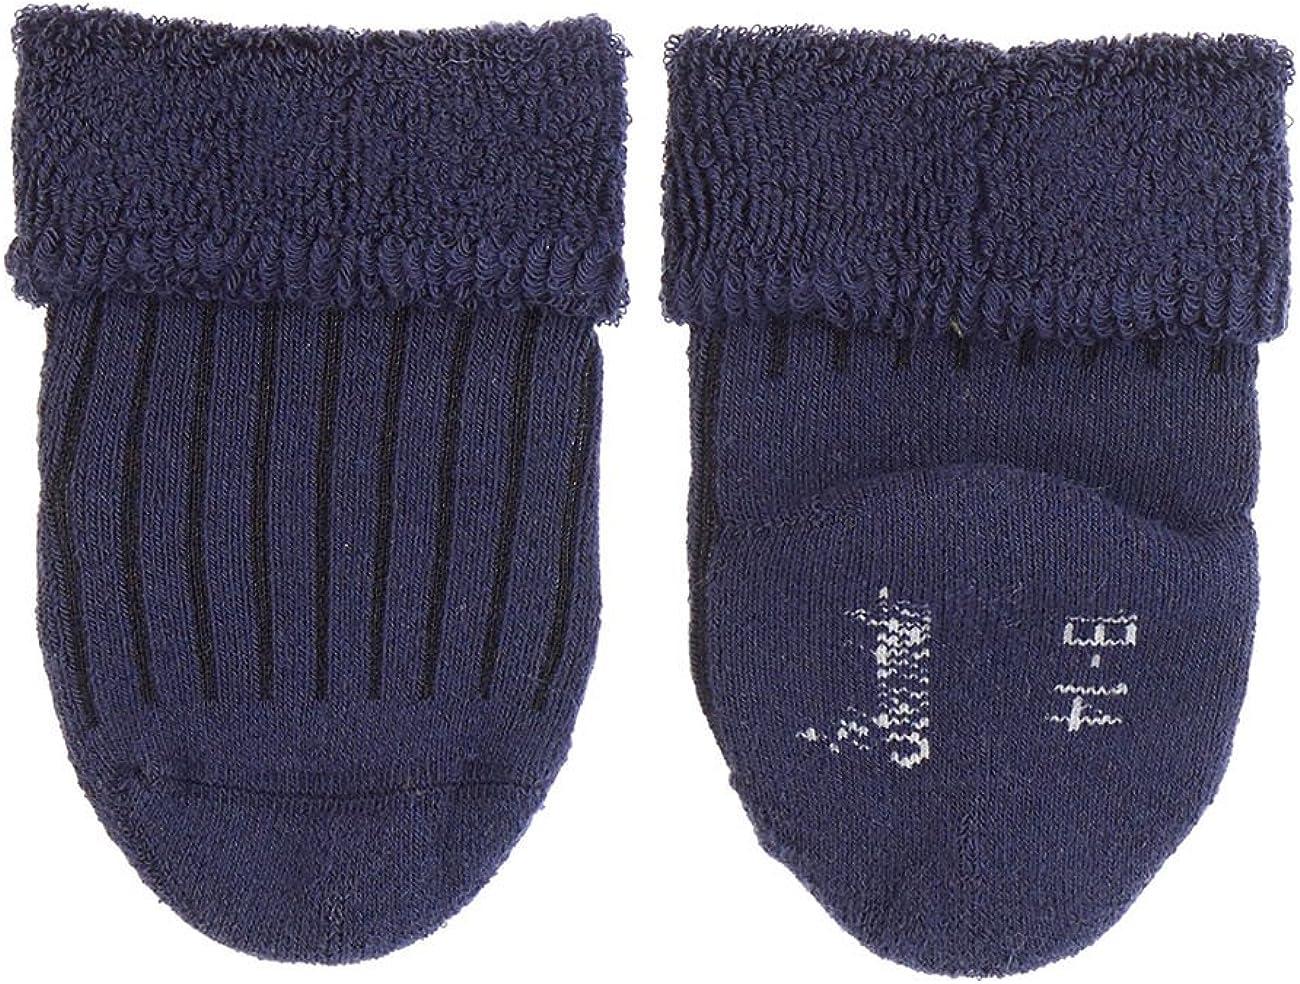 Sterntaler Boys Baby-s/öckchen Uni Socks